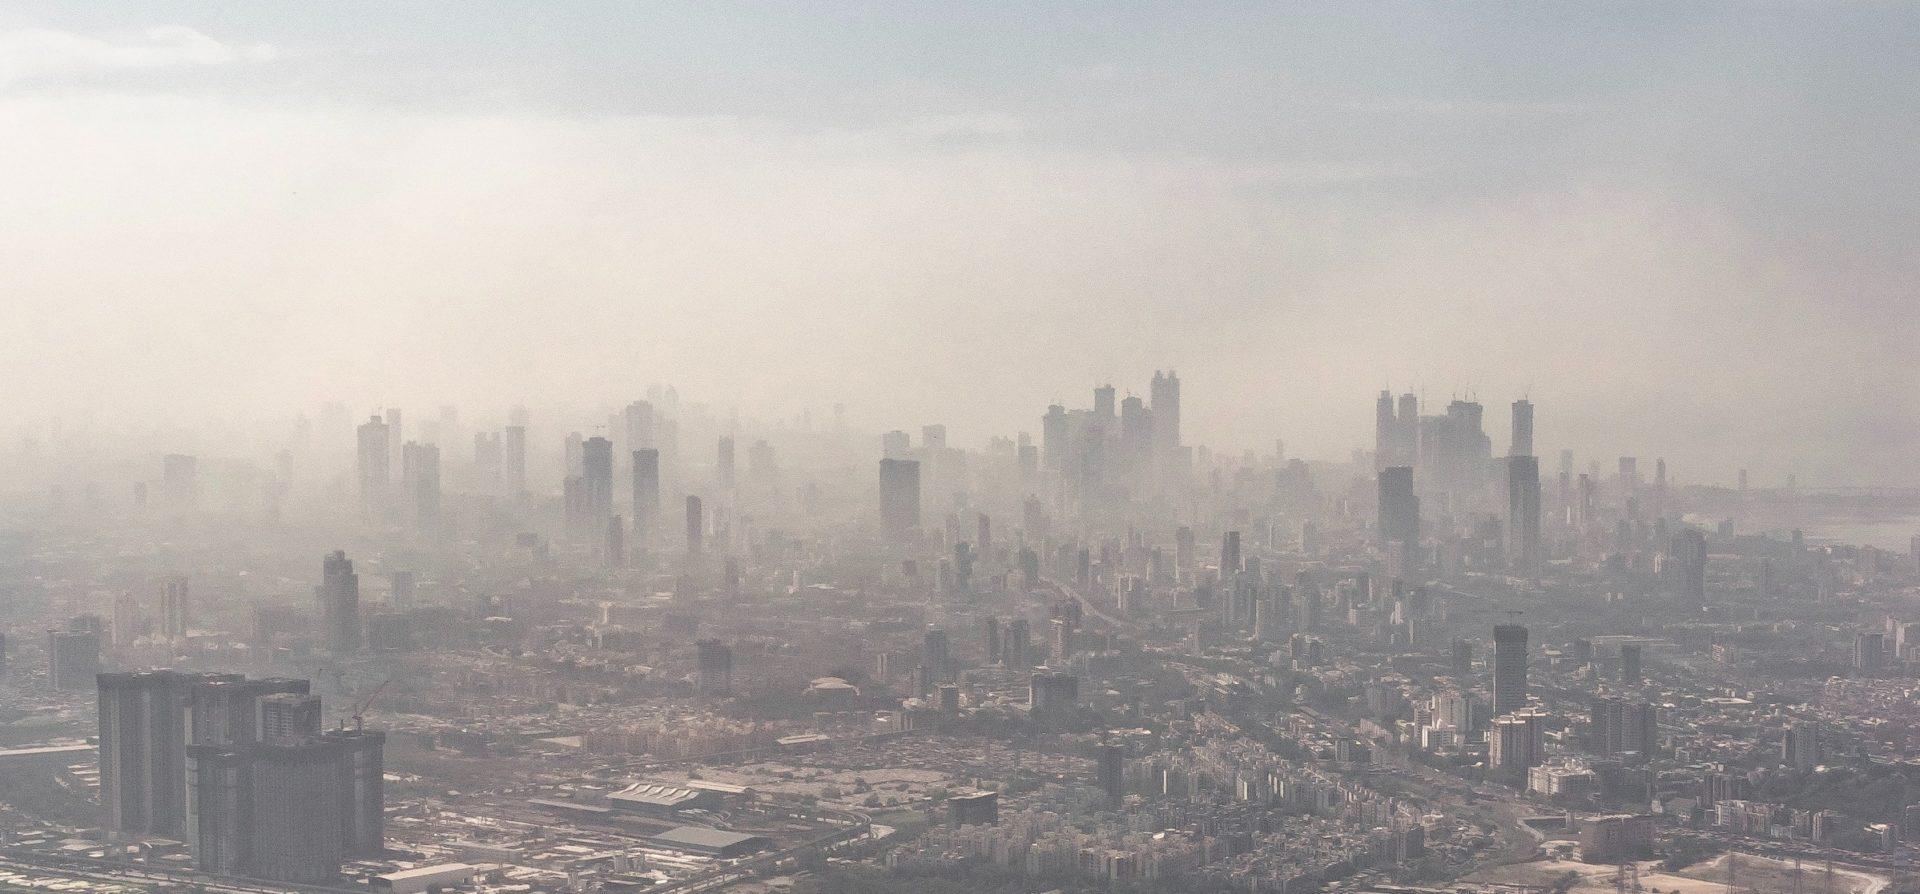 Smog in Mumbai, India